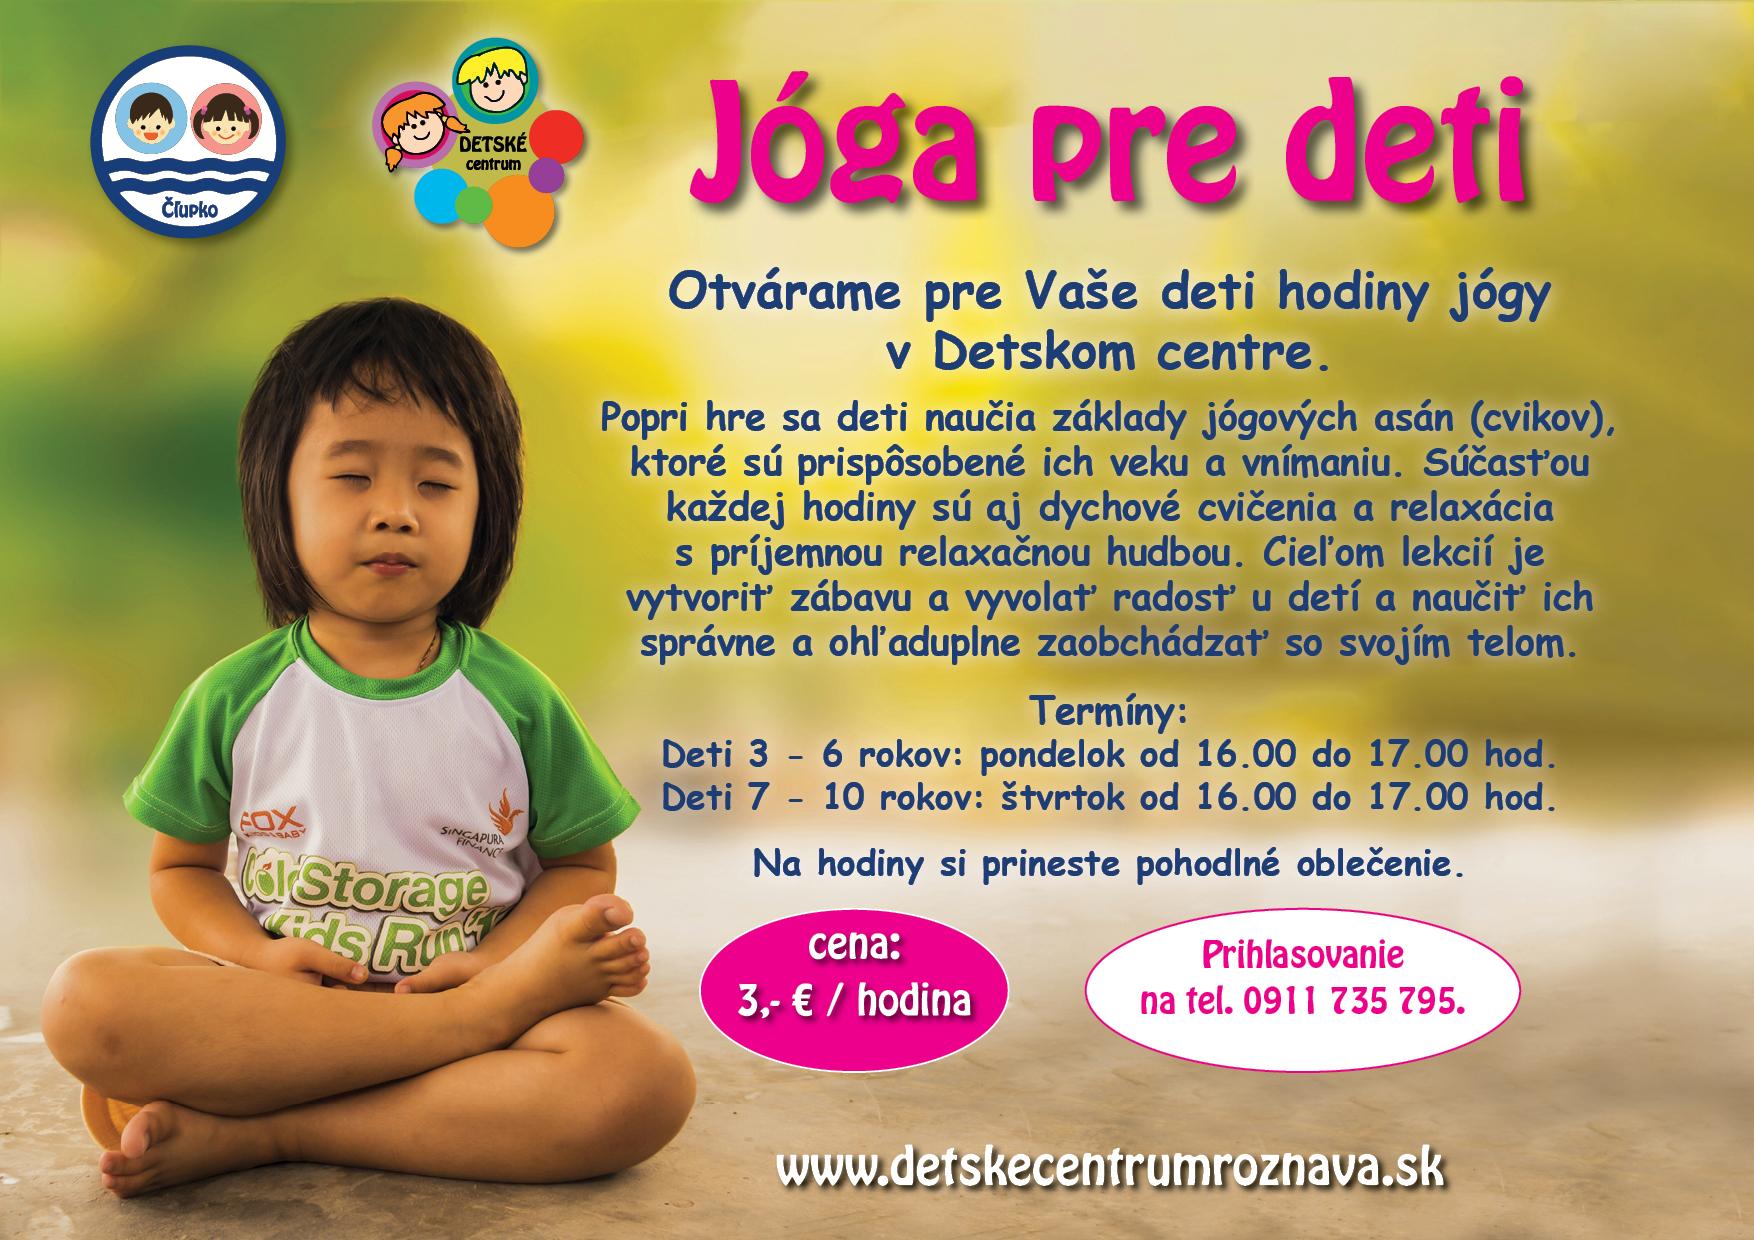 Jóga pre deti v Detskom centre